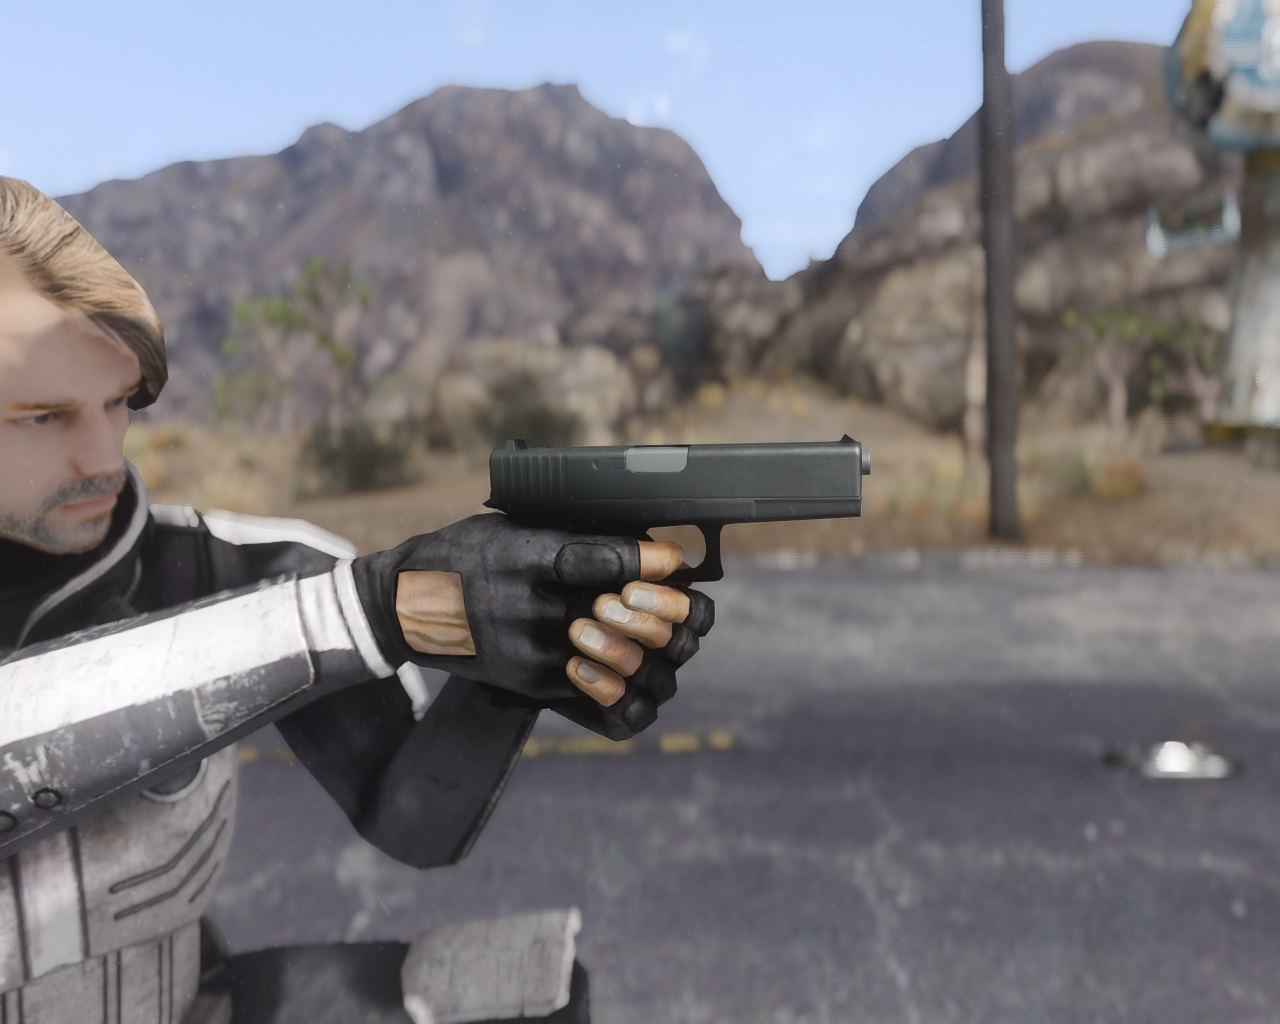 Glock 17 для Fallout New Vegas для Fallout: New Vegas - Скриншот 1